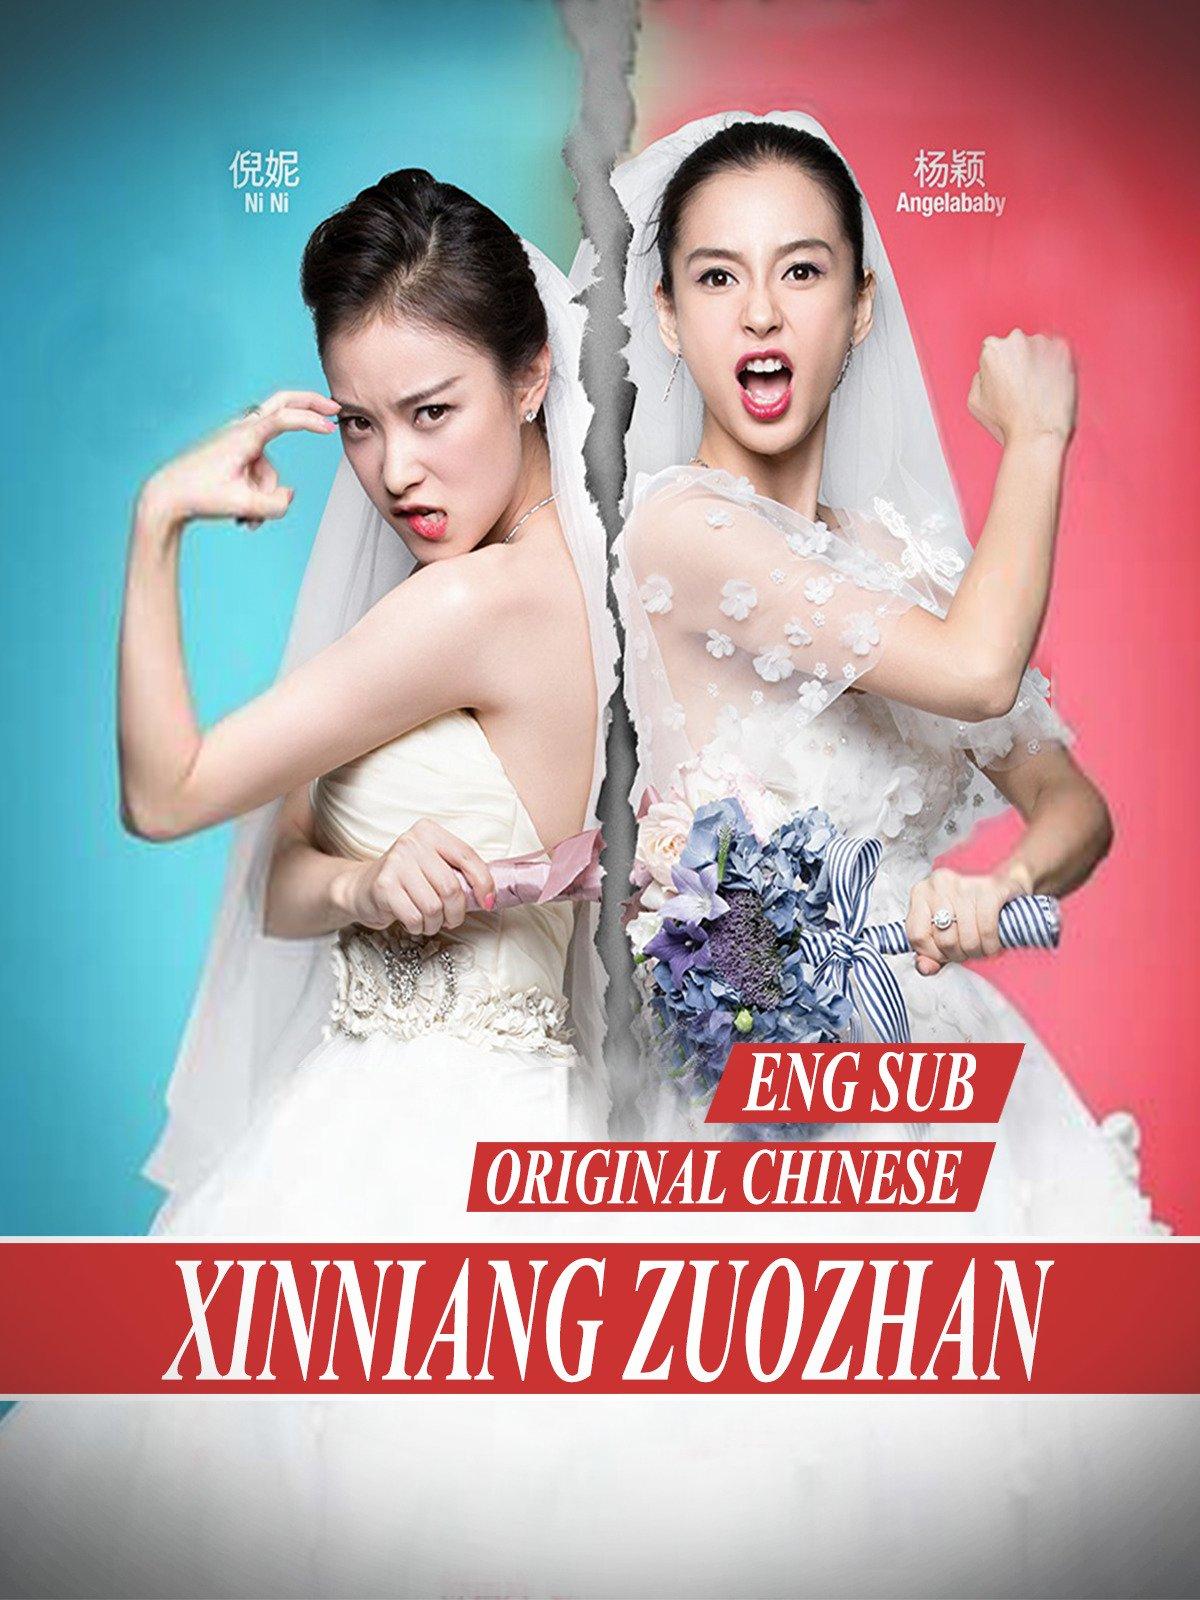 Xinniang Zuozhan [Eng Sub] original Chinese on Amazon Prime Video UK